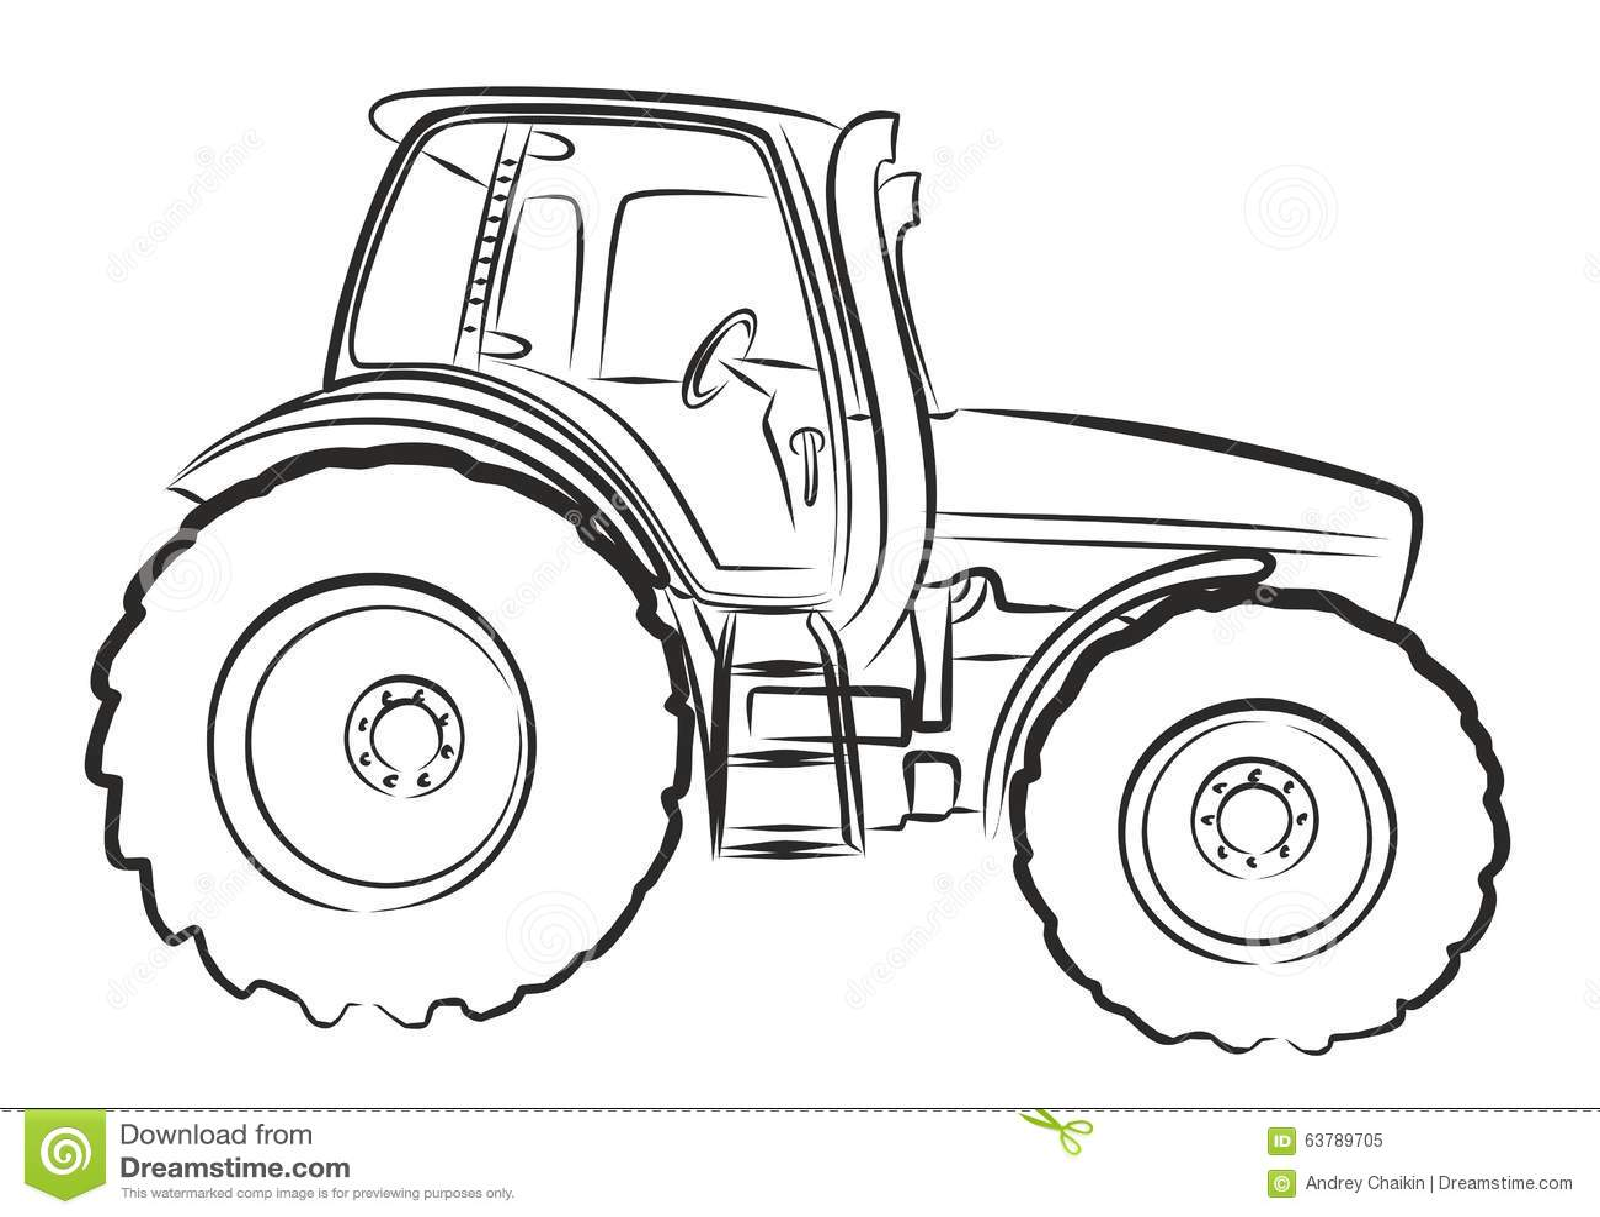 traktorskizze vektor abbildung illustration von